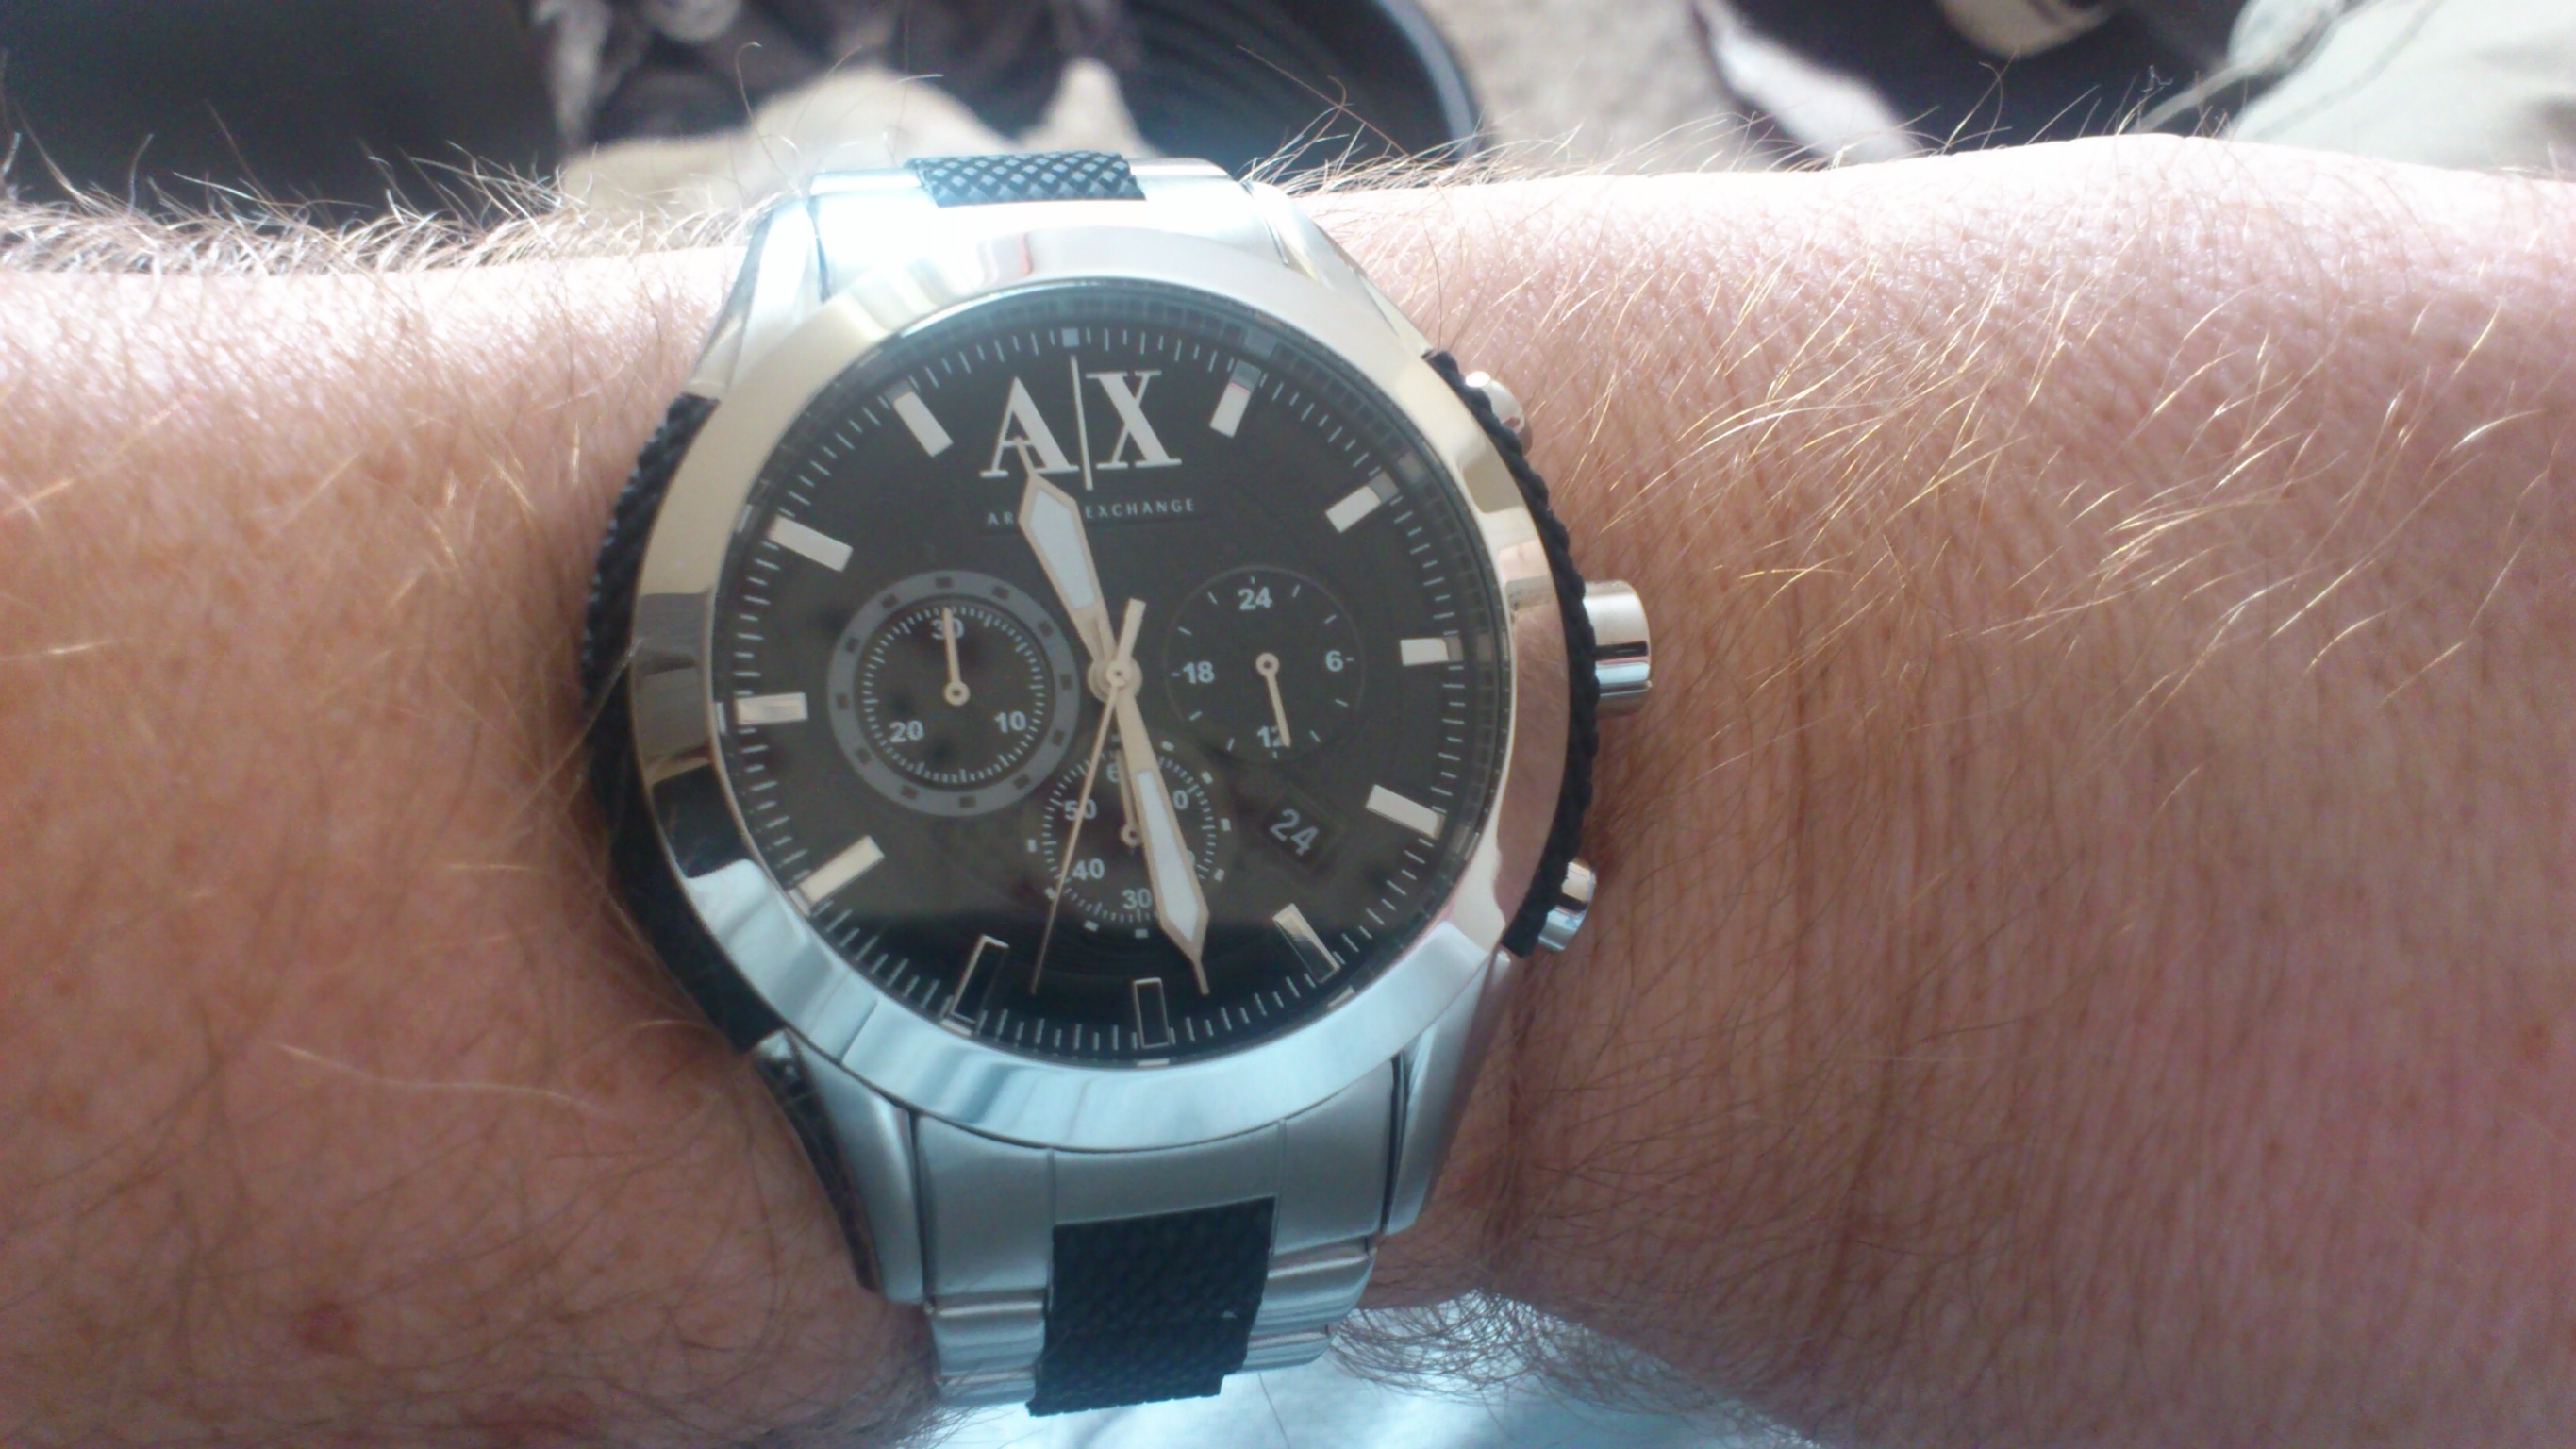 a70c73581 Gents Armani Exchange Chronograph Watch (AX1214) | WatchShop.com™